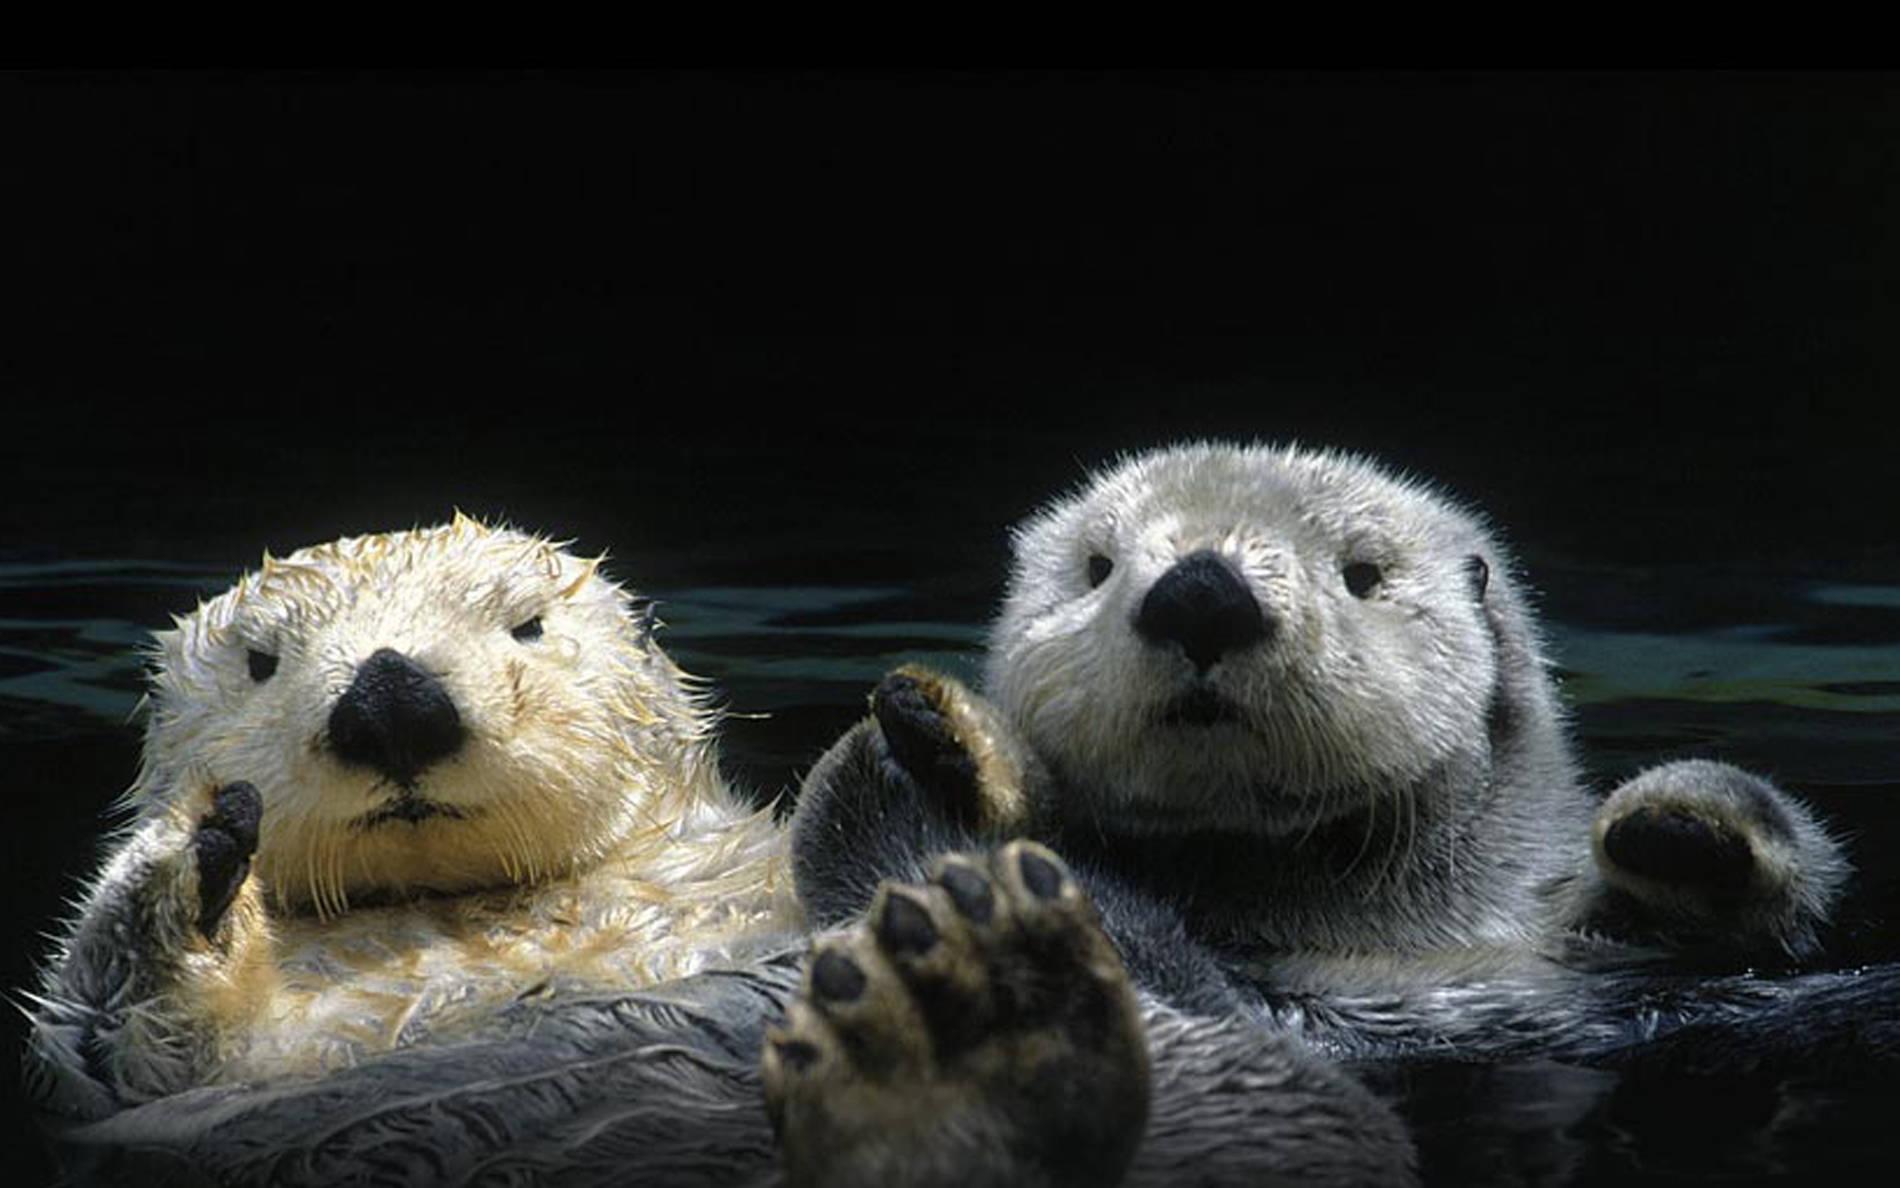 Animals Otters 19001188 Wallpaper 869162 1900x1188